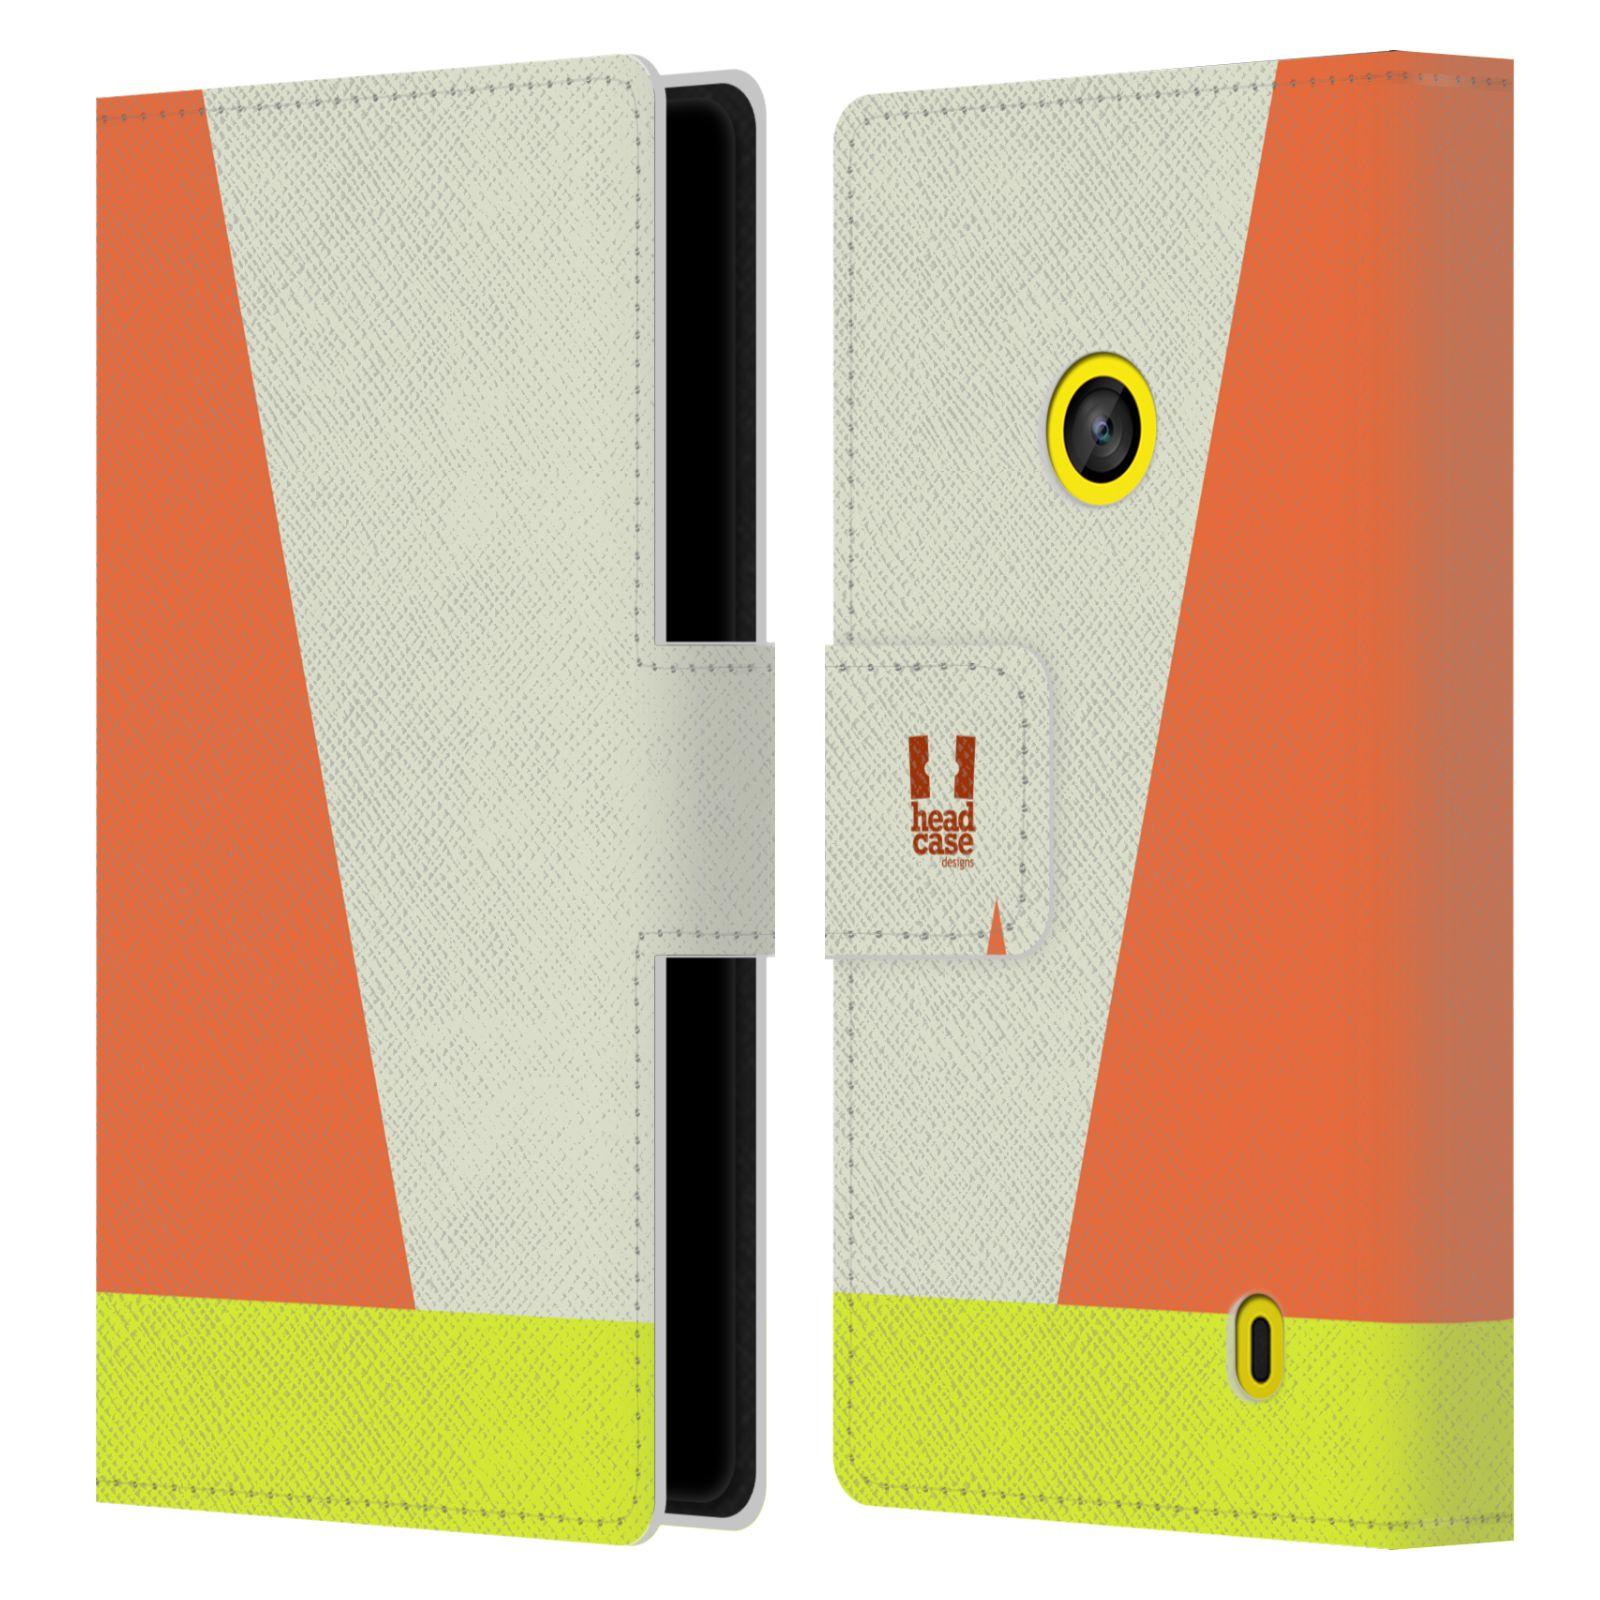 HEAD CASE Flipové pouzdro pro mobil Nokia LUMIA 520/525 barevné tvary slonová kost